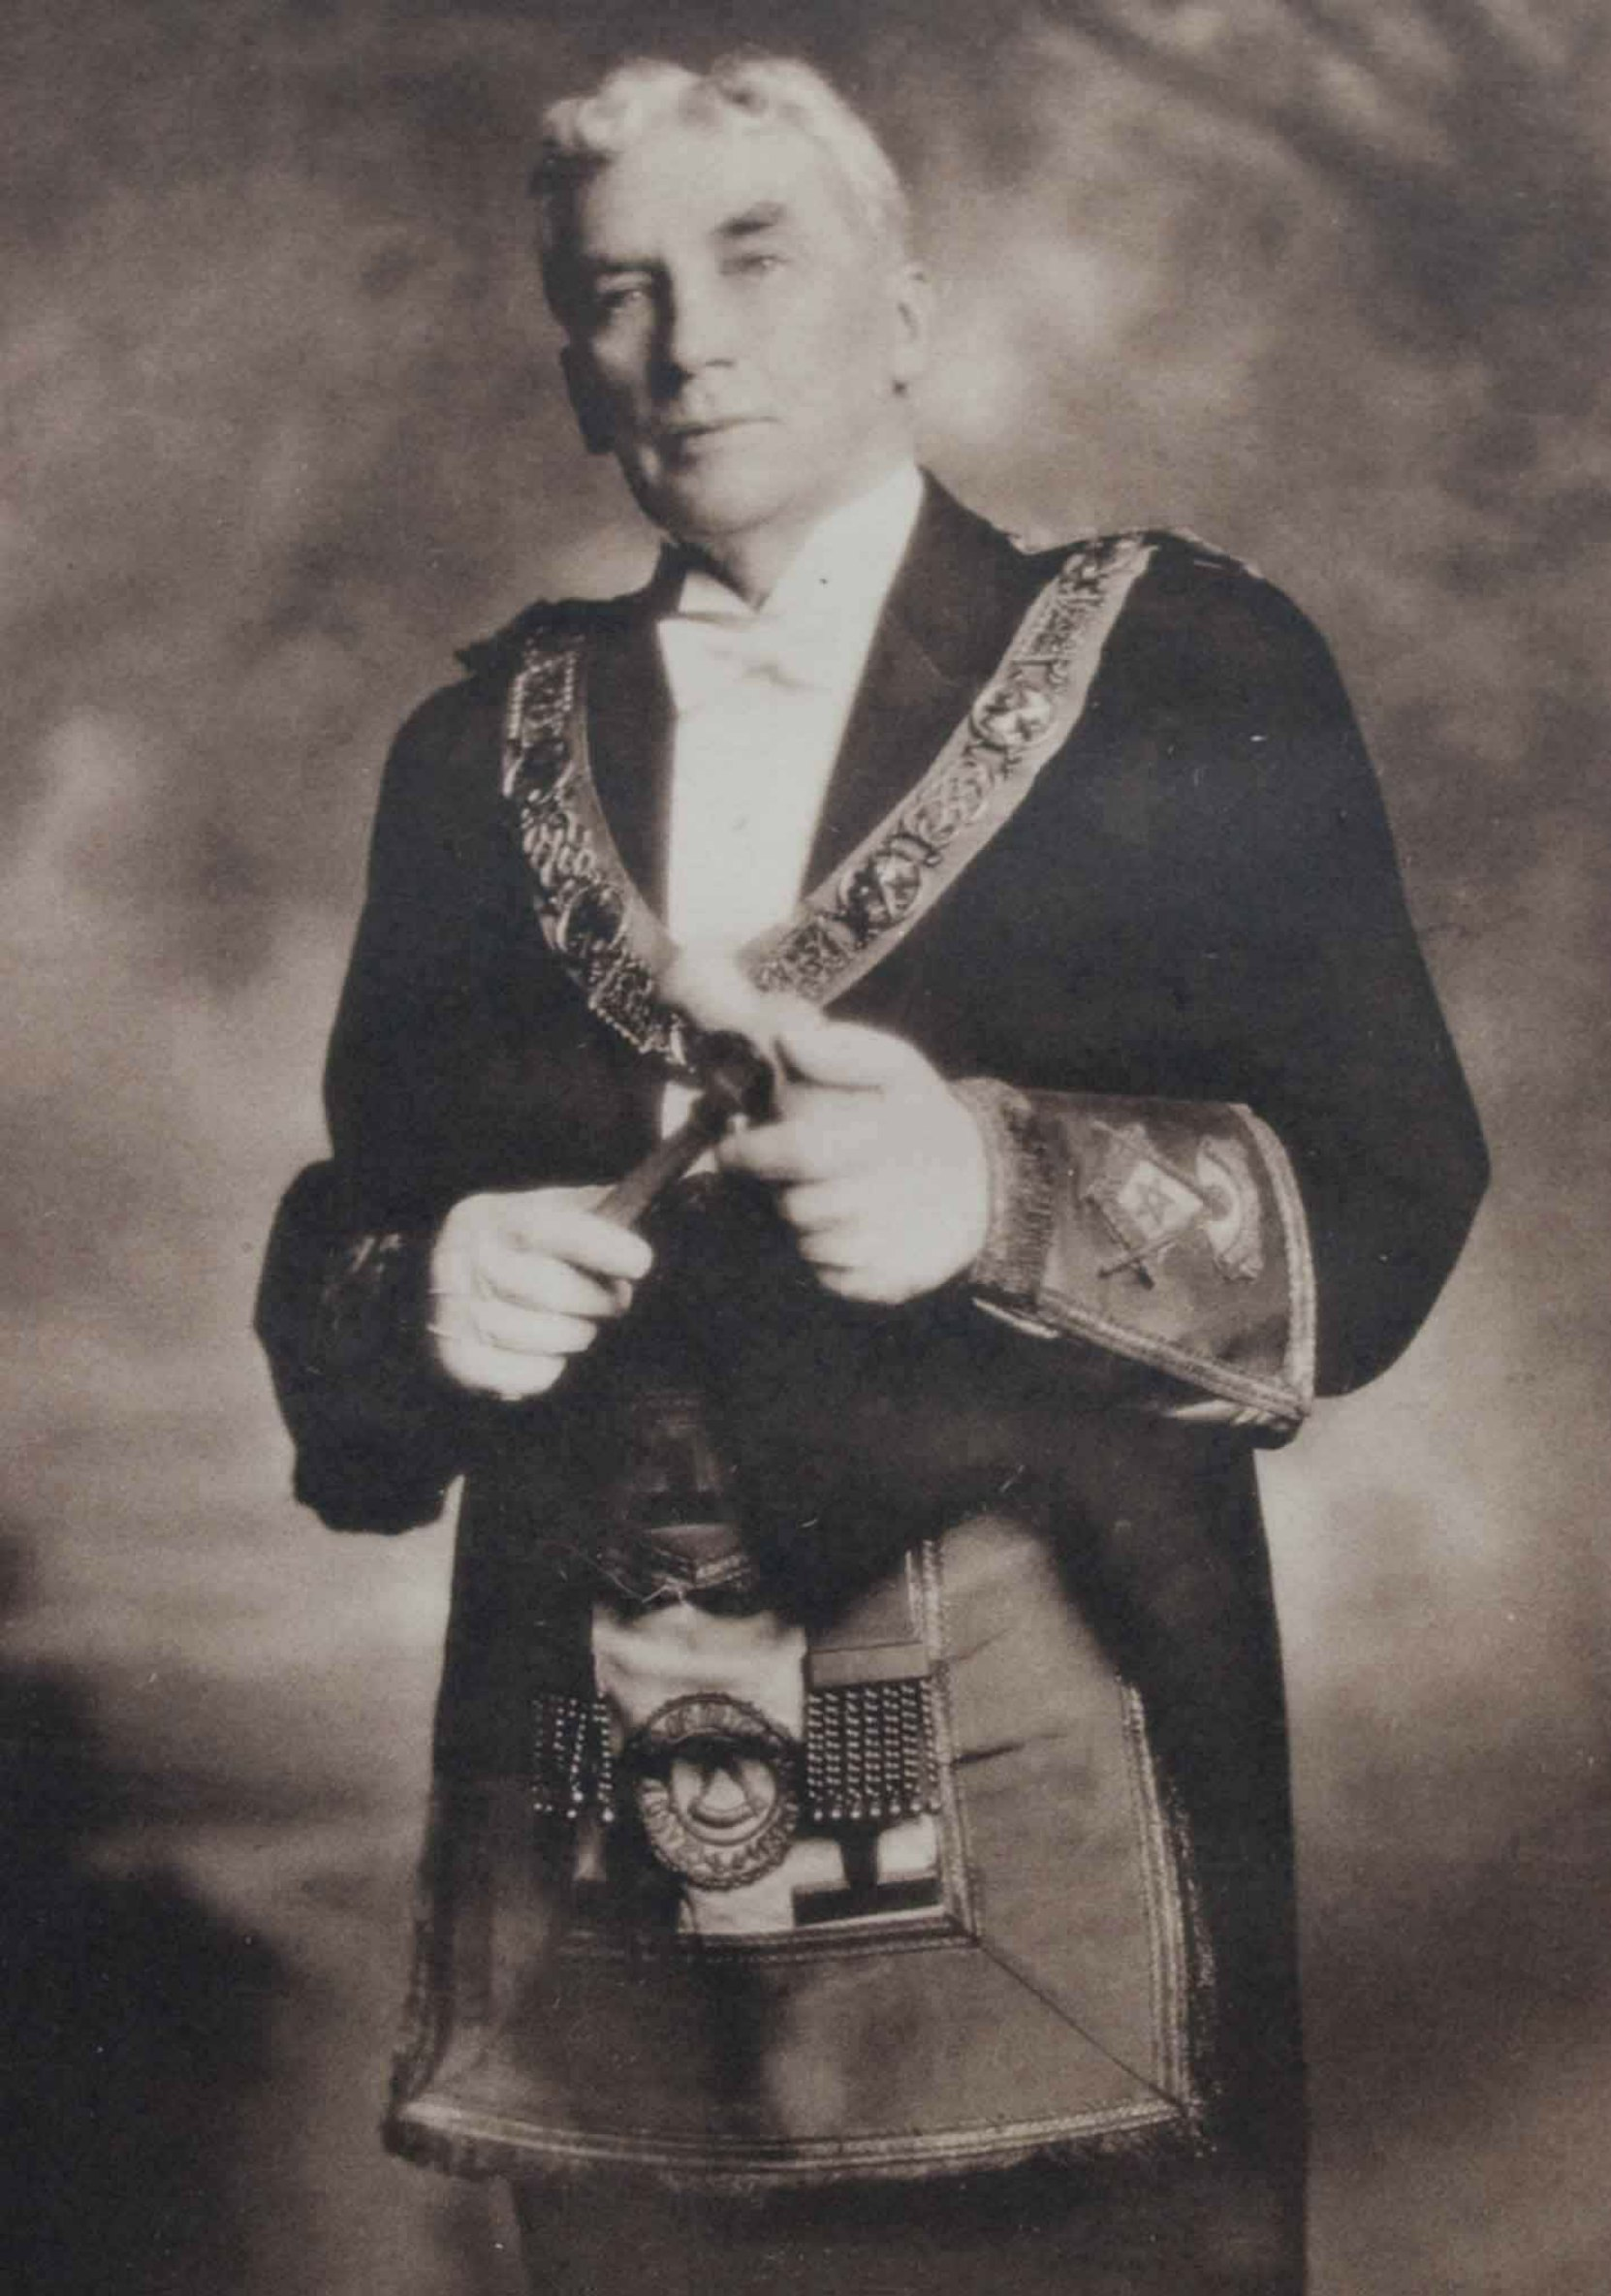 Donald Edward Kerr as Grand Master of B.C. & Yukon